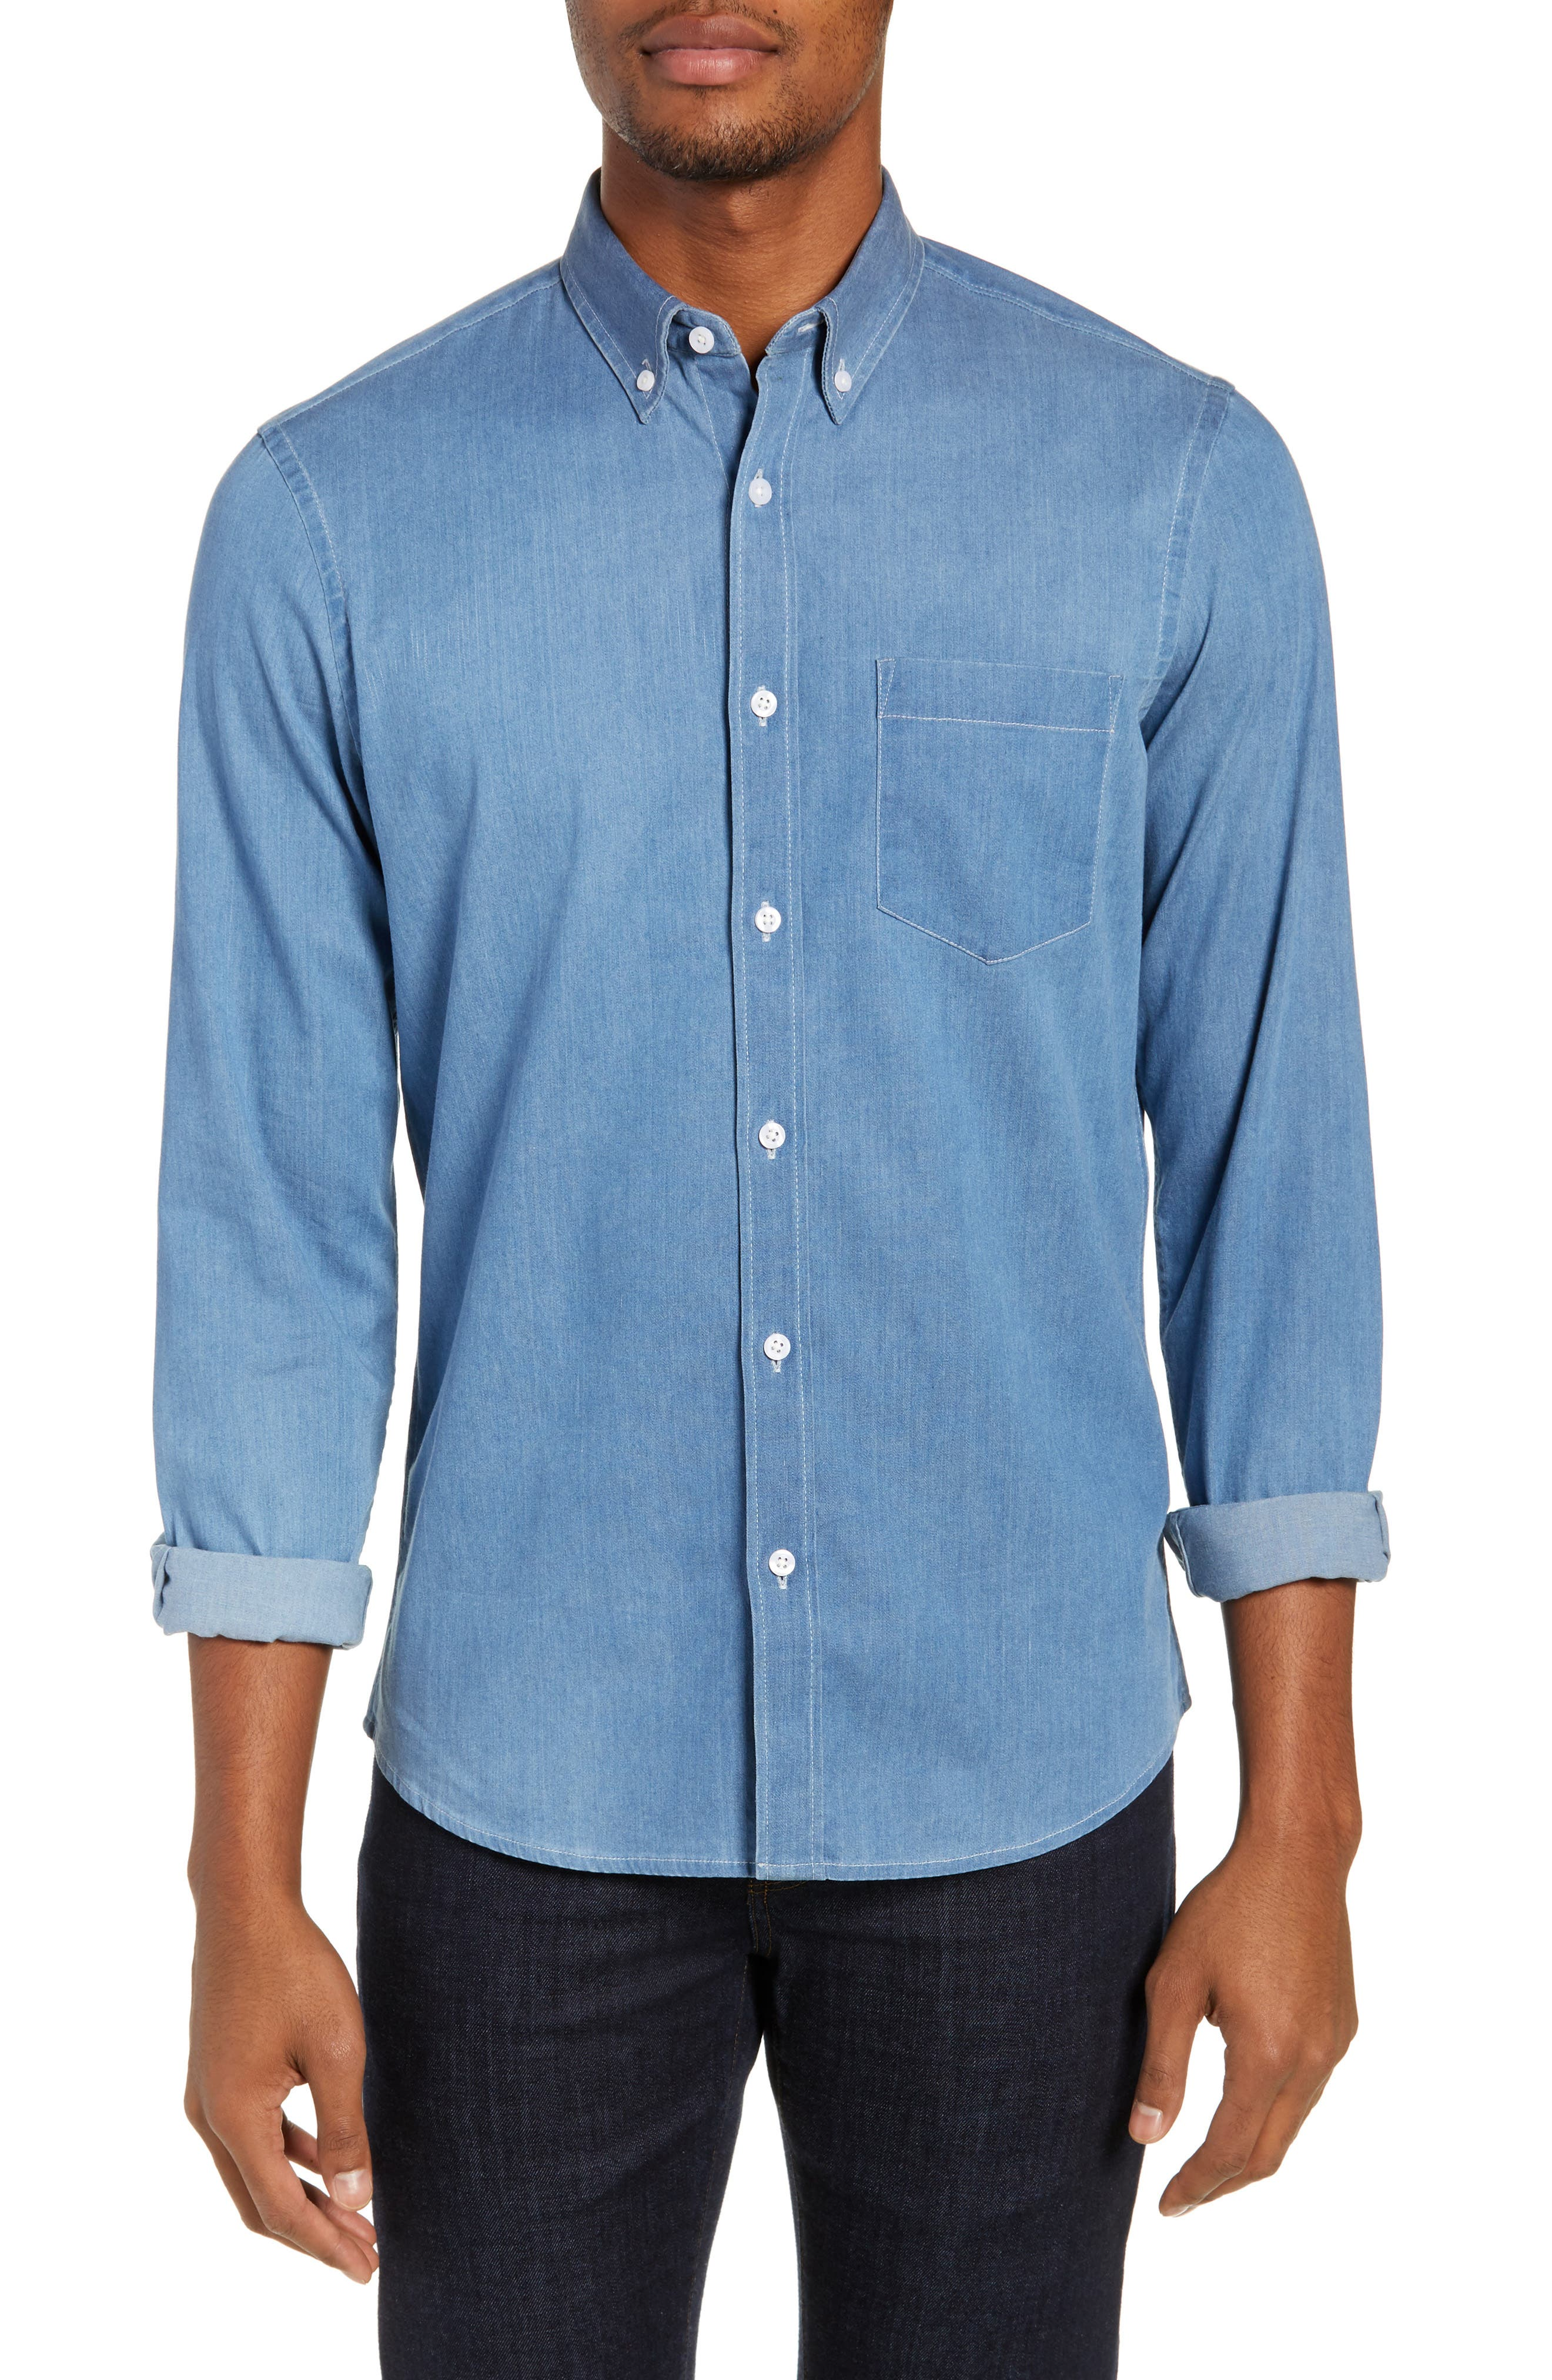 Slim Fit Chambray Sport Shirt, Main, color, BLUE HEAVEN CHAMBRAY